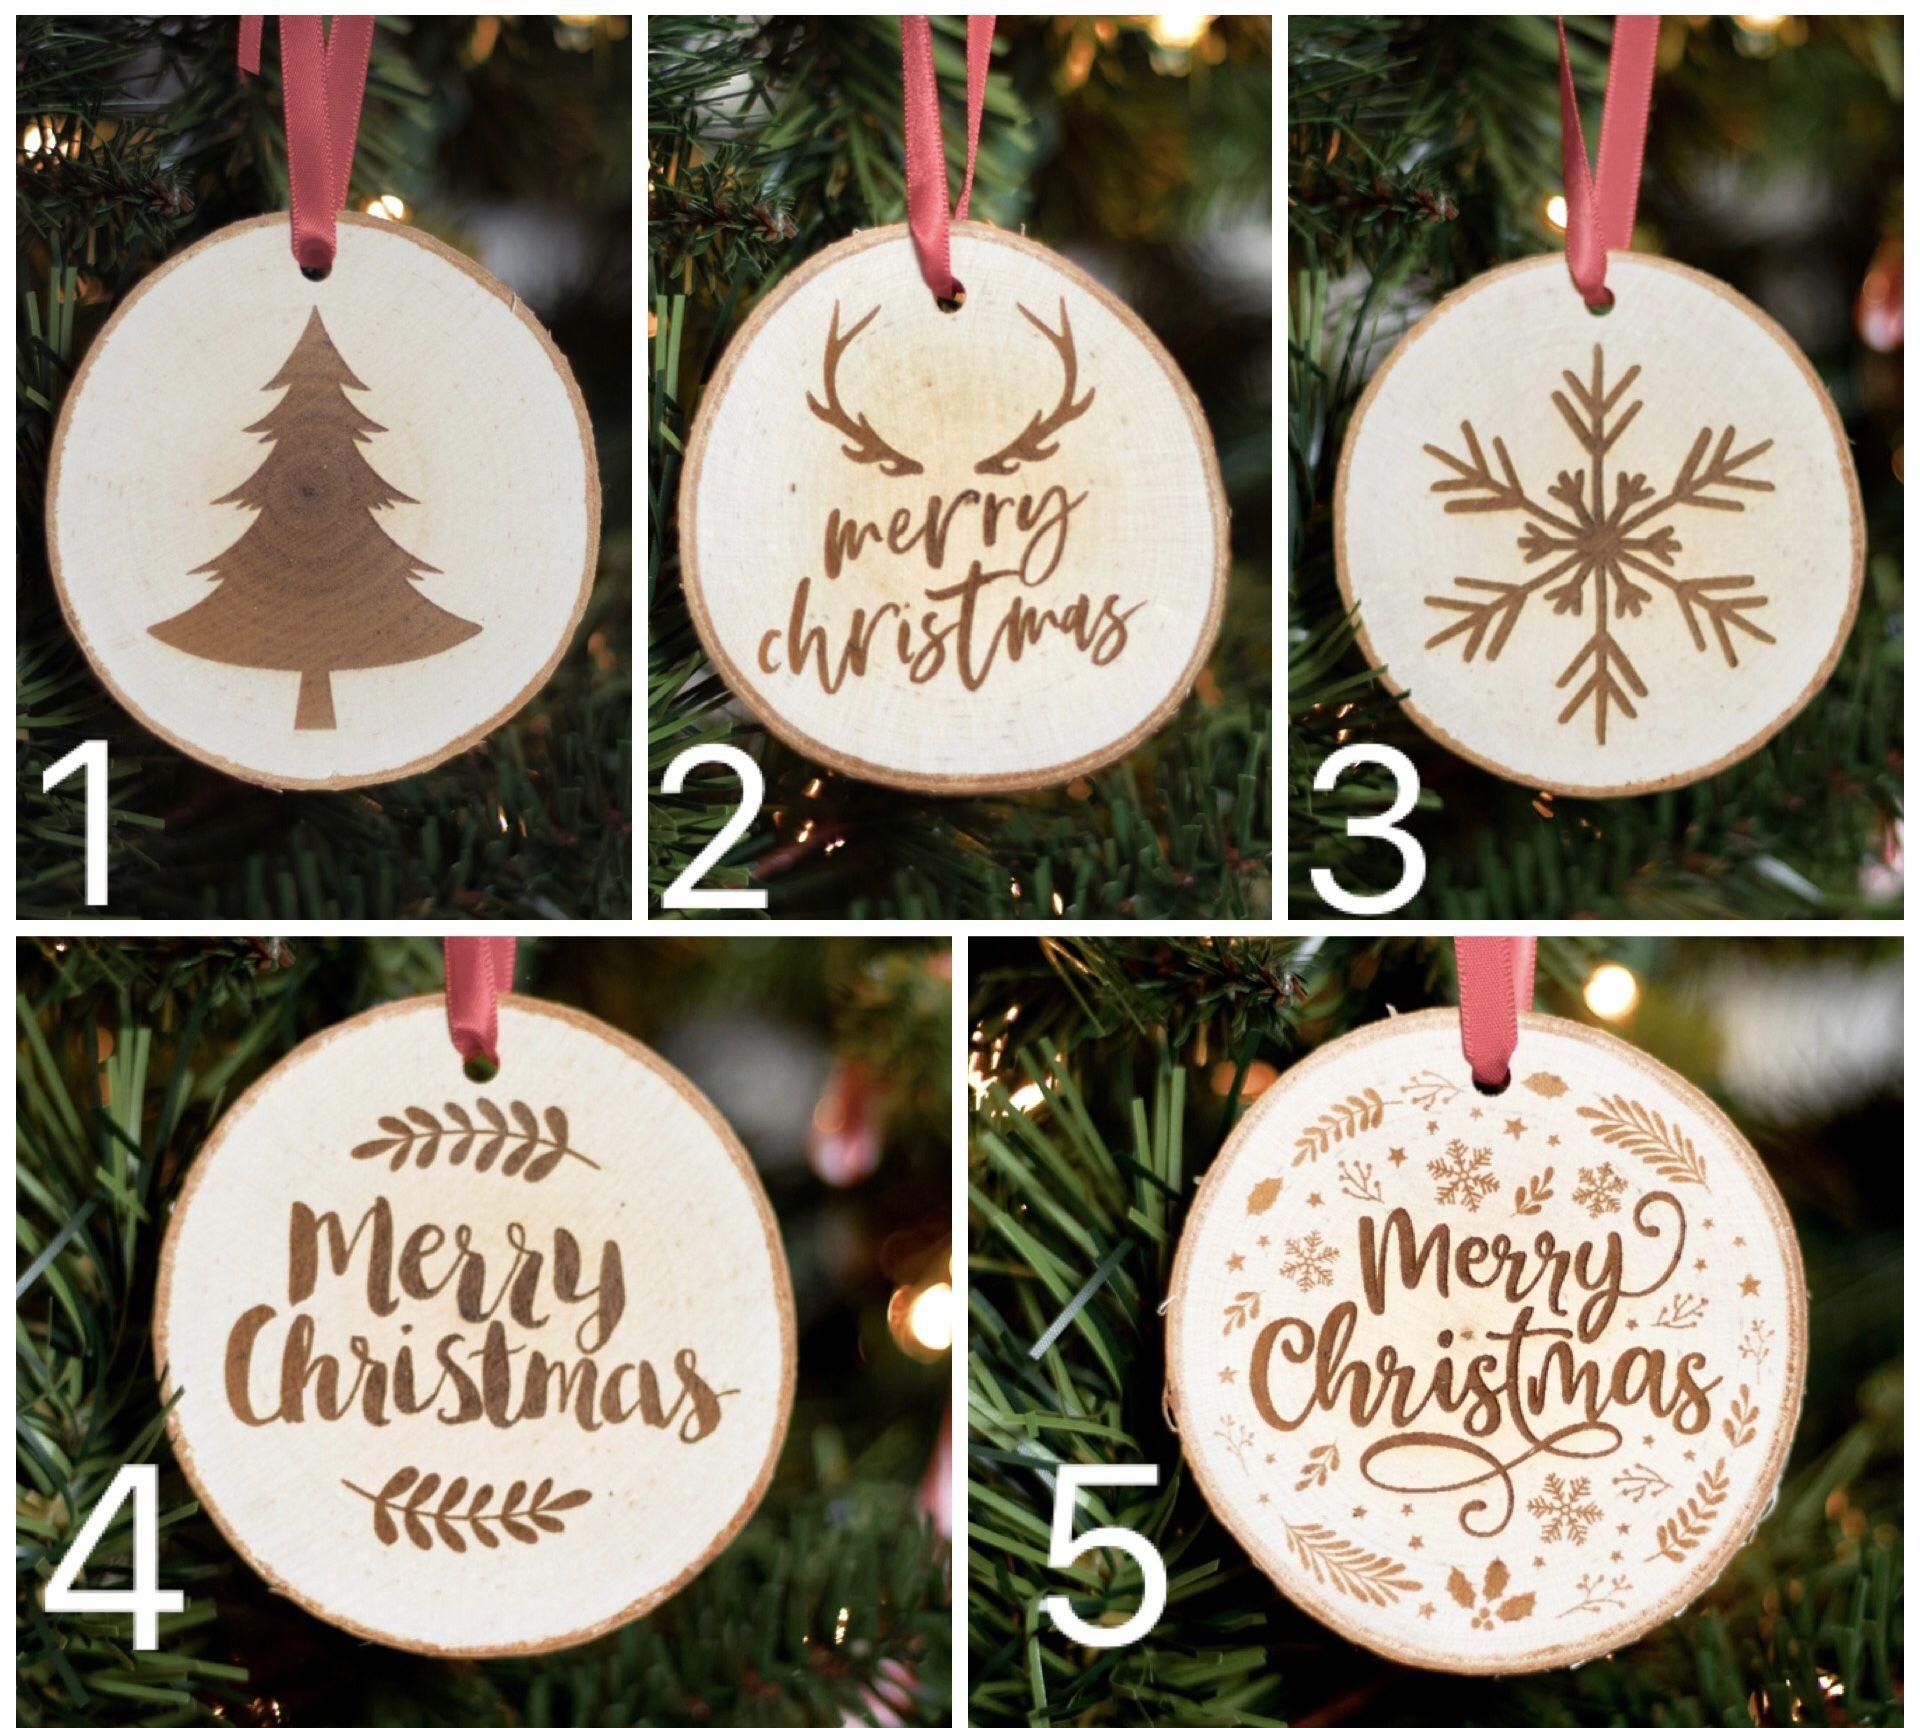 Real Wood Slice Christmas Ornaments Christmas Tree Ornaments Rustic Christmas Ornamen Christmas Ornaments Rustic Christmas Ornaments Wood Christmas Ornaments